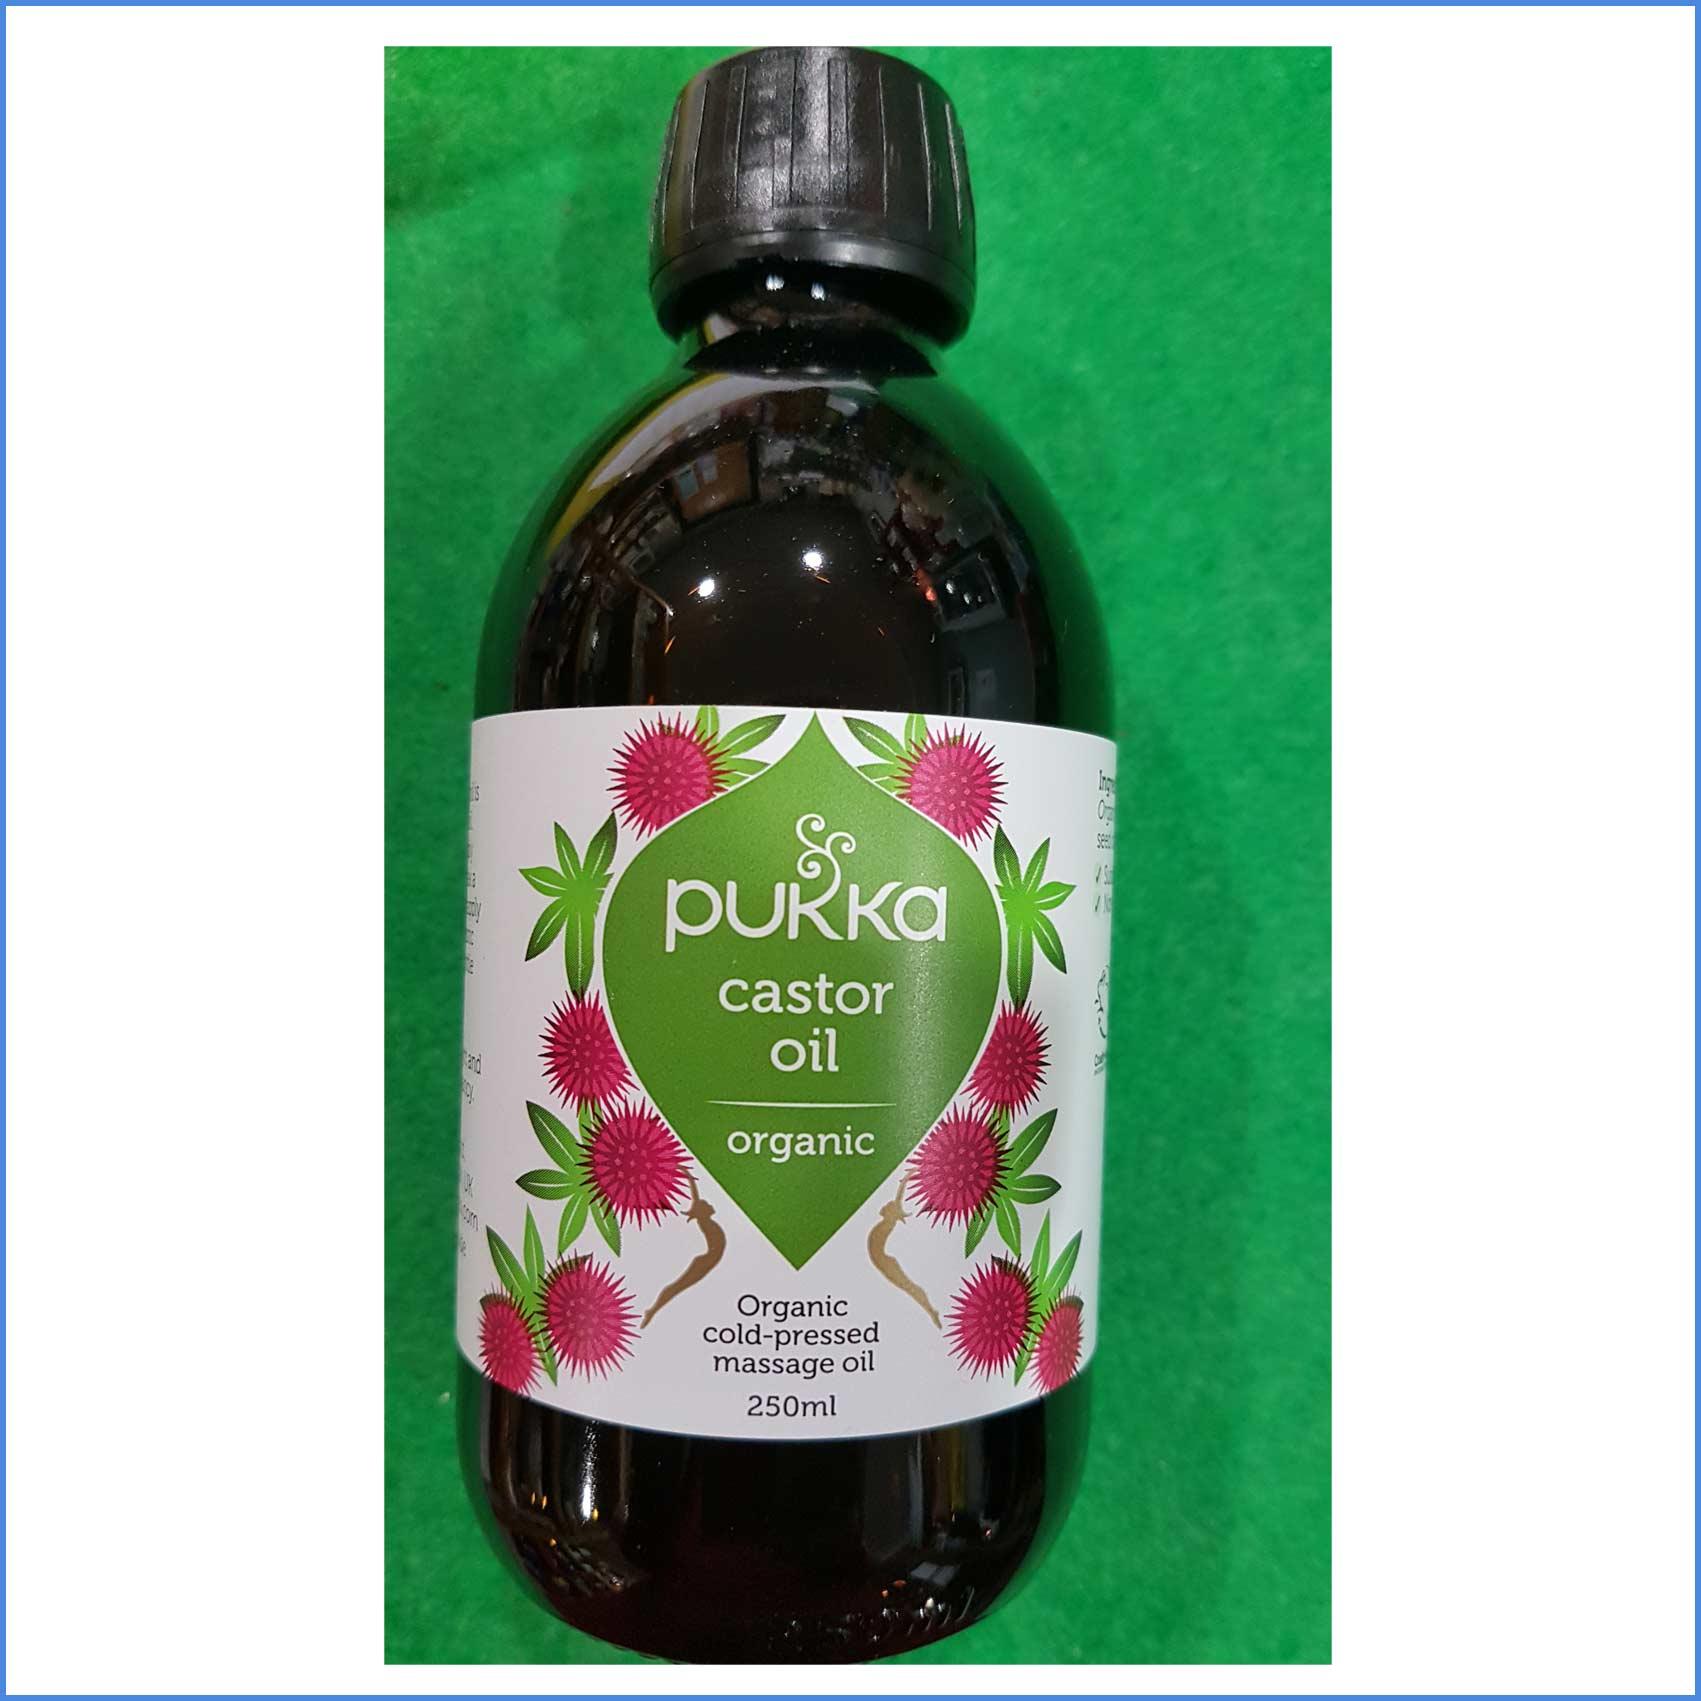 Pukka Castor Oil Organic